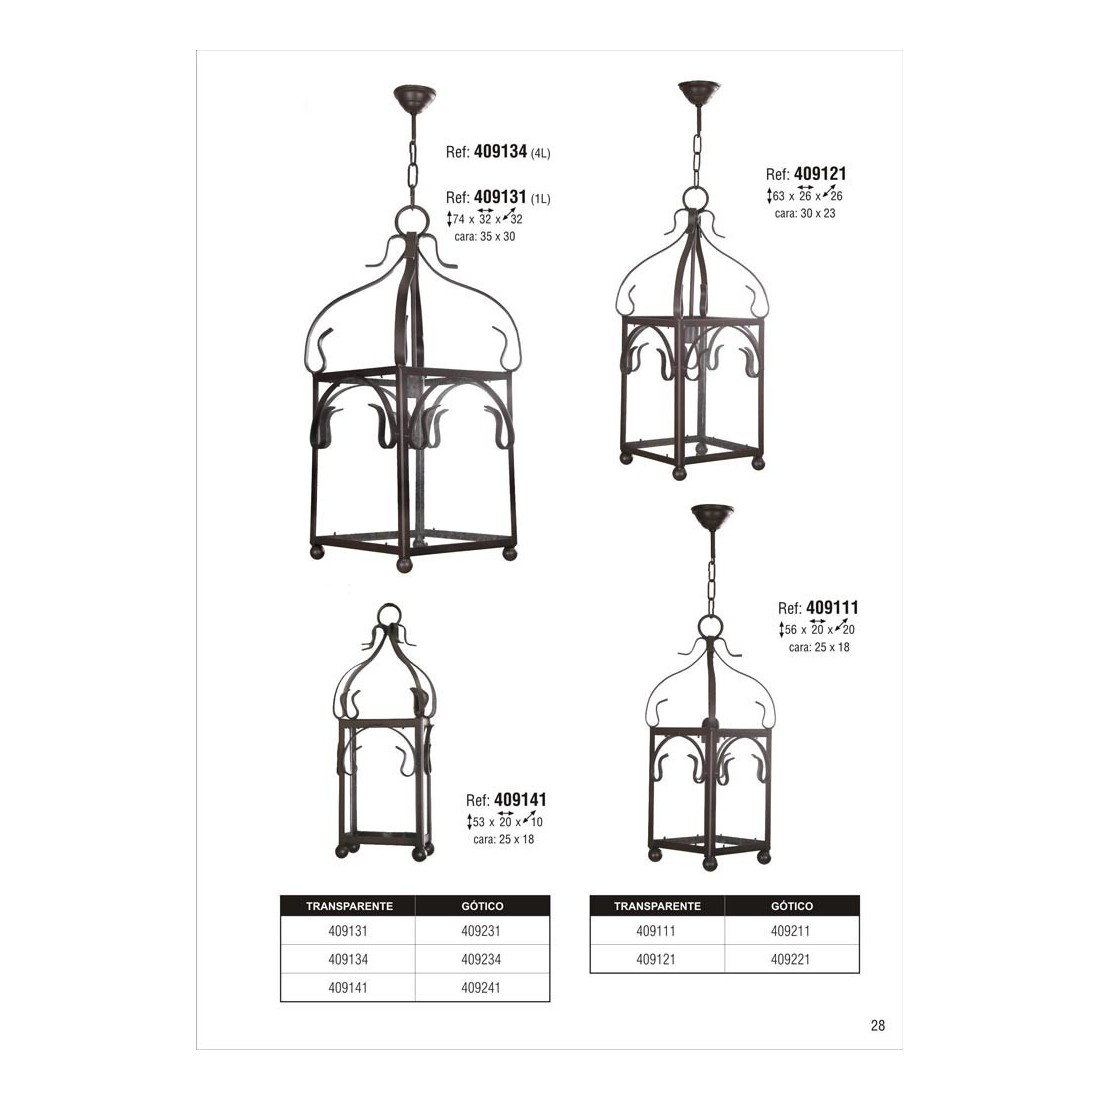 Lamparas forja lamparas forja online lamparas forja - Lamparas de exterior baratas ...